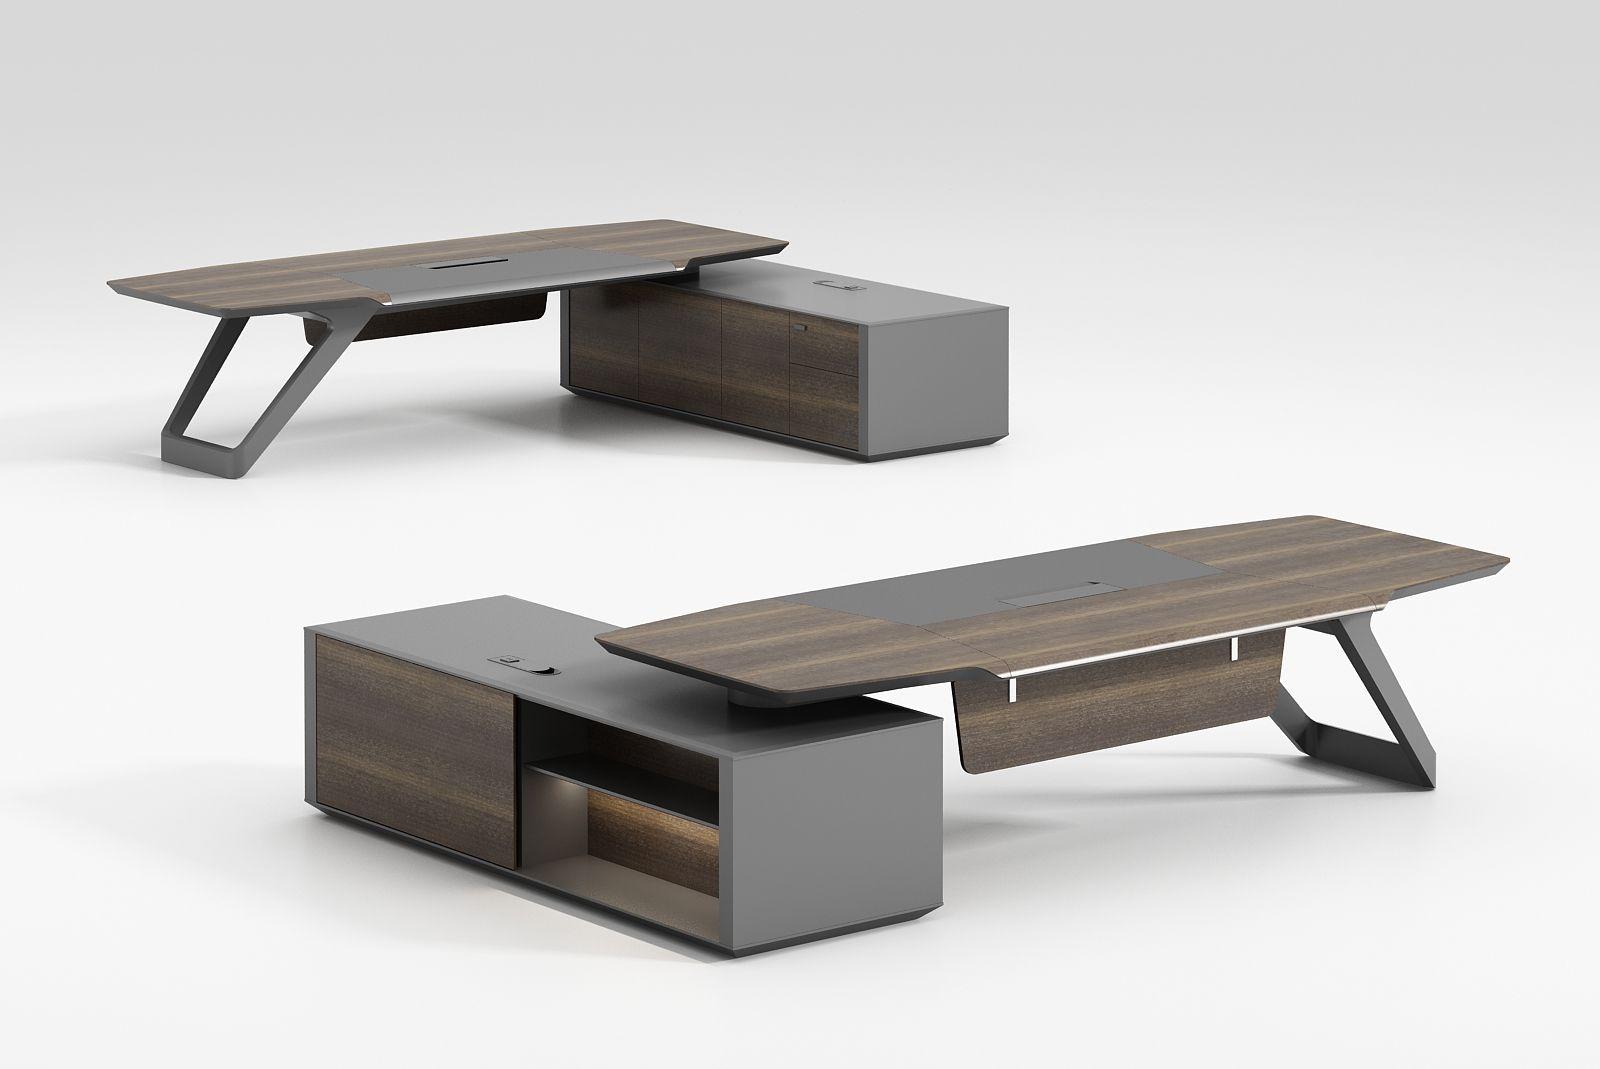 Executive desk #melaminetable #MFCdesk #officetable #officetable #wooddesk #woodtable #woodendesk #woodentable